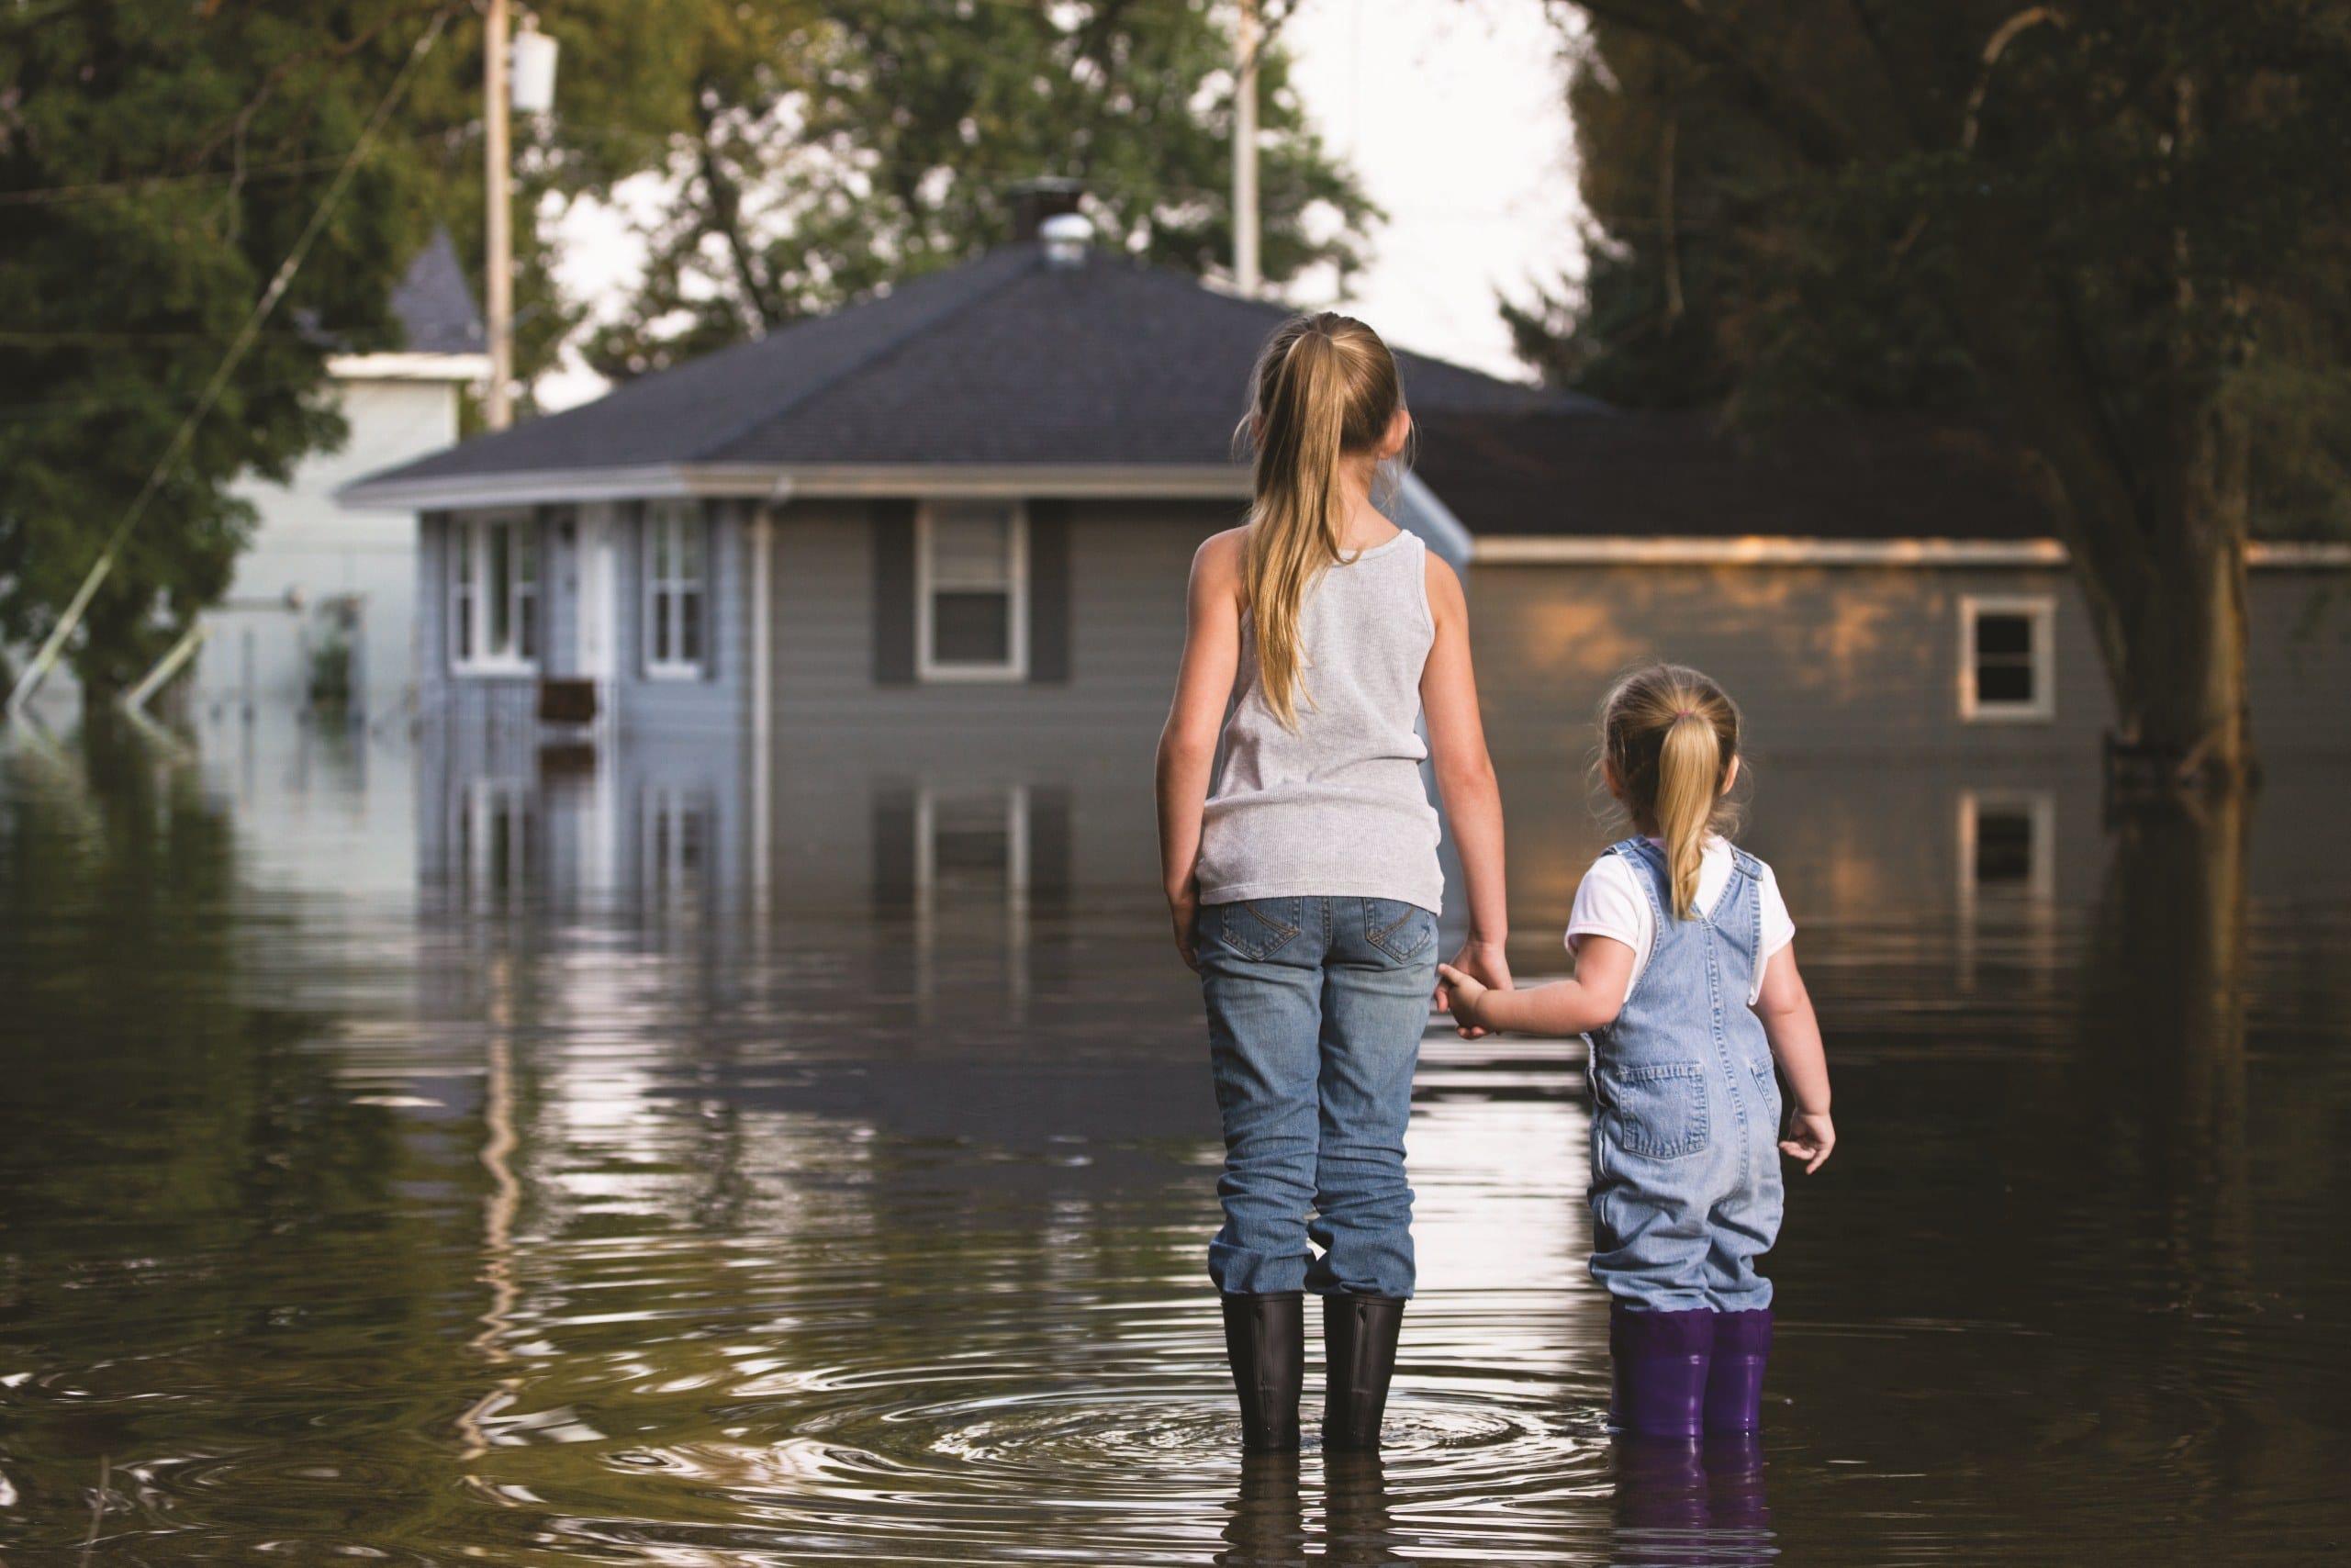 Kitchener-Waterloo Ontario flood damage repair